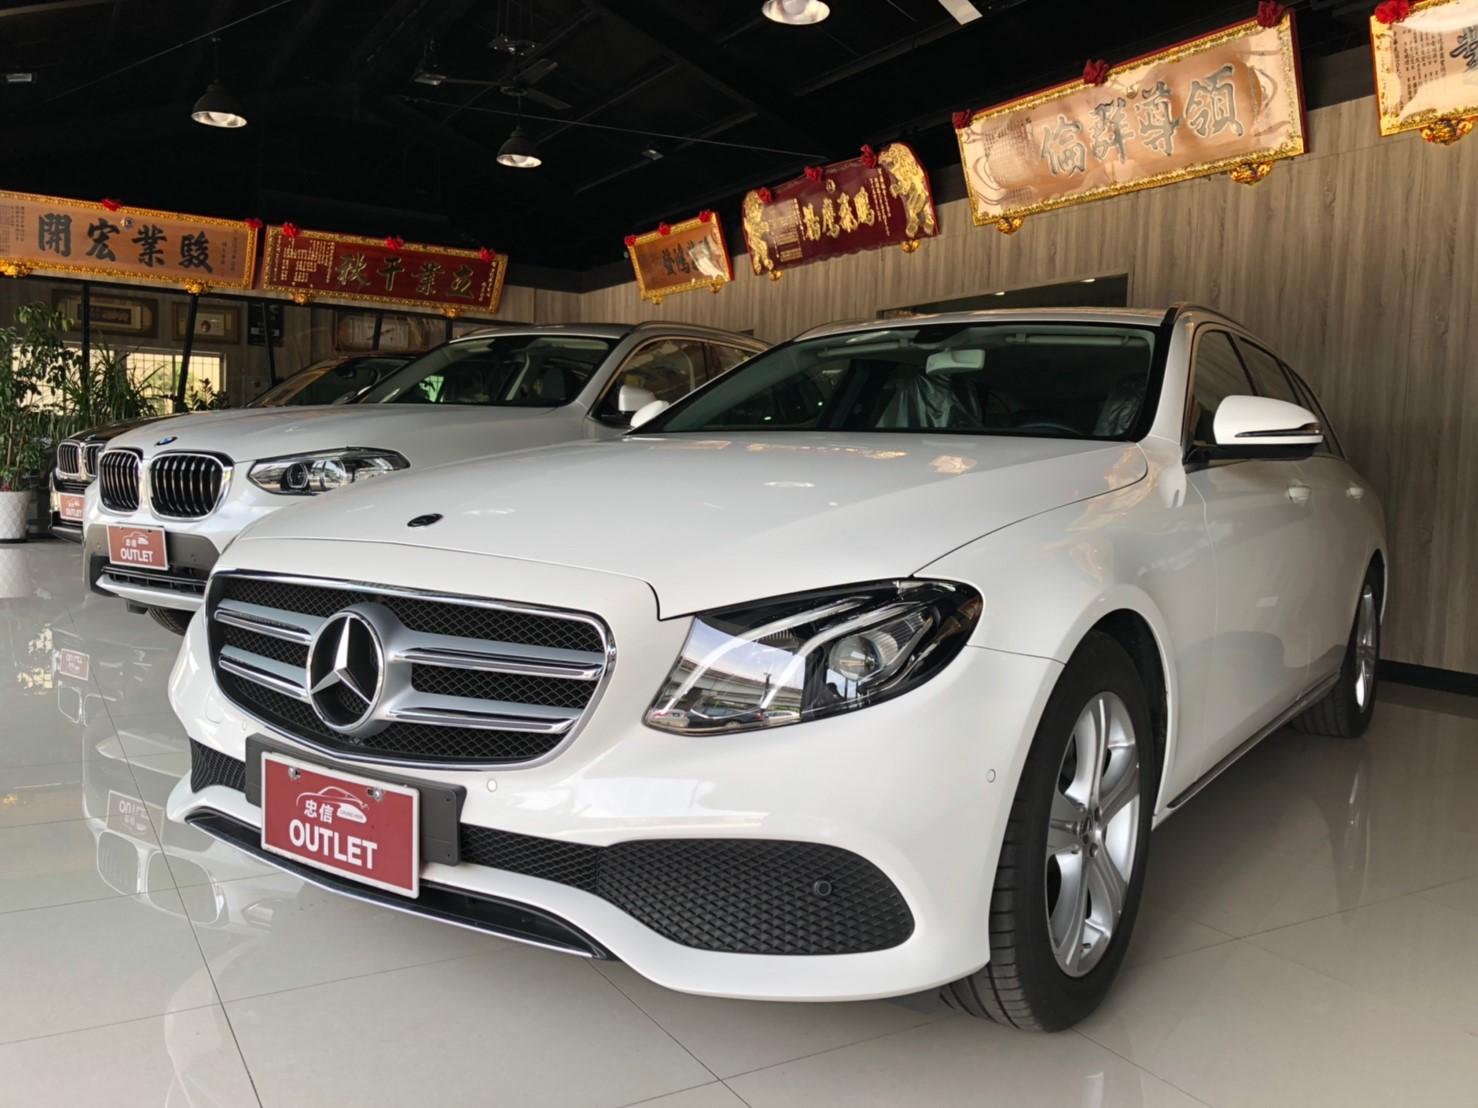 2018 M-benz E-class estate